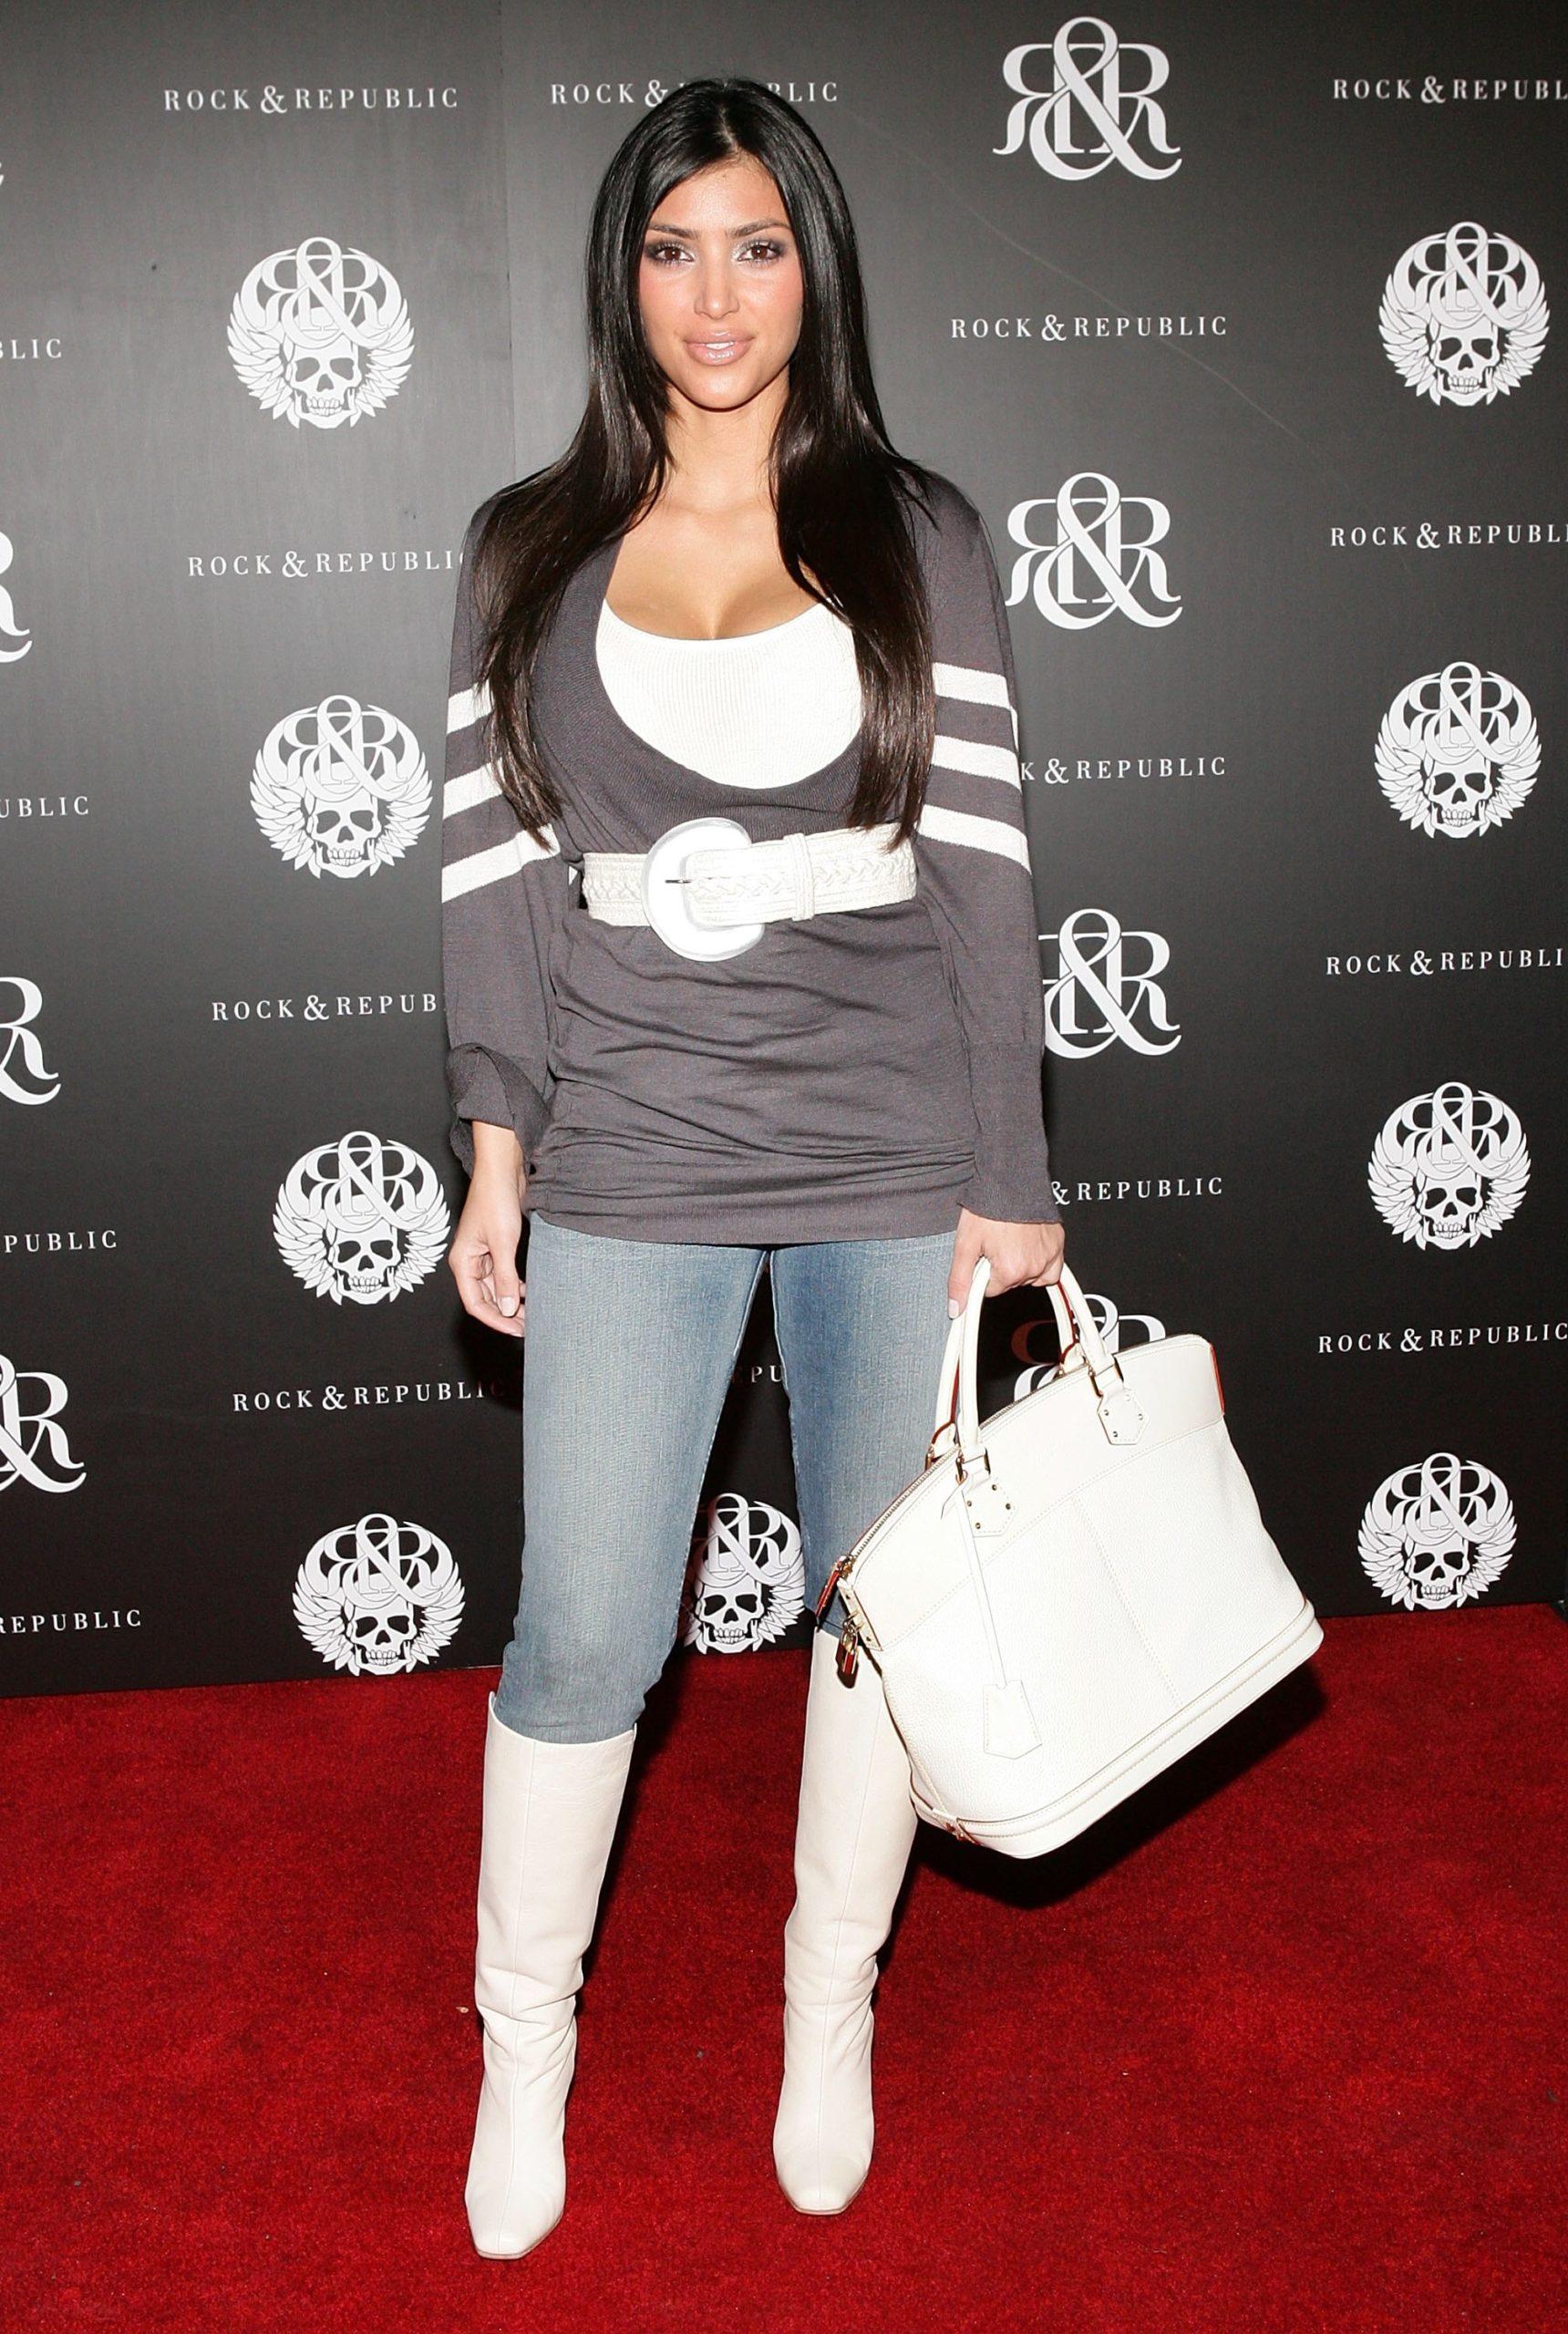 Ким Кардашьян (2006). Фото: Vince Bucci/Getty Images